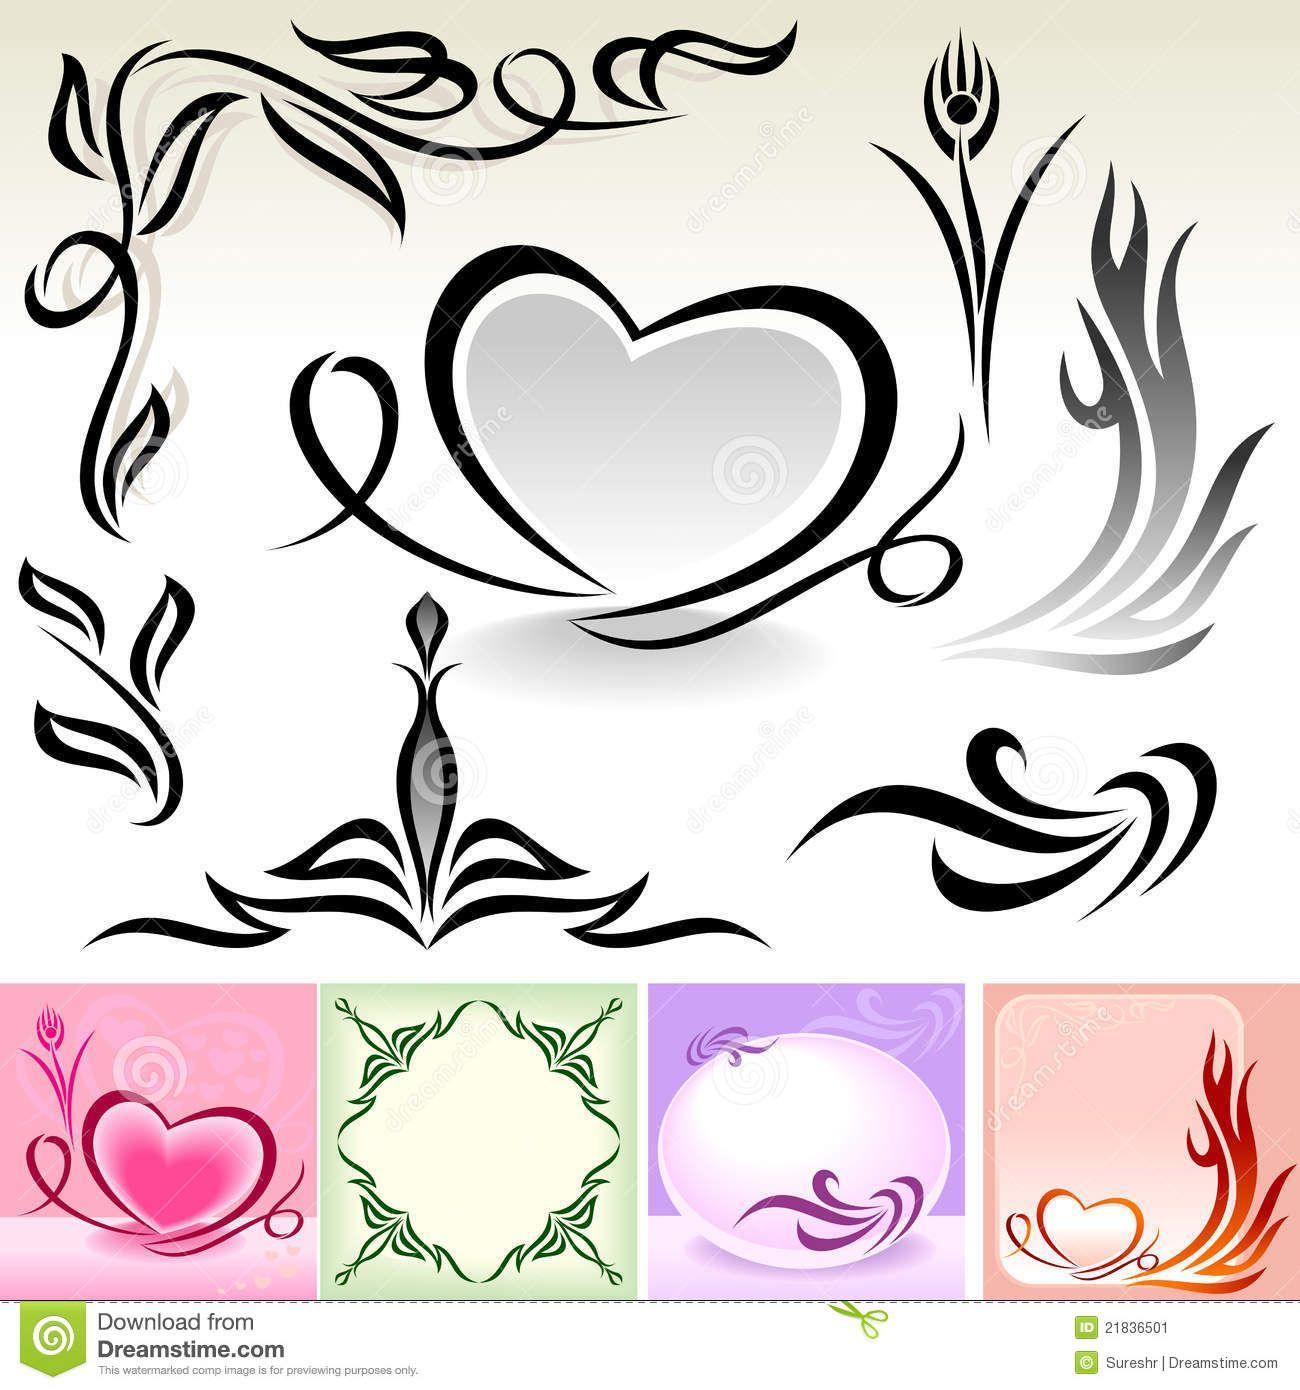 Natural calligraphic designs and decoration stock image image natural calligraphic designs and decoration stock image image sisterspd